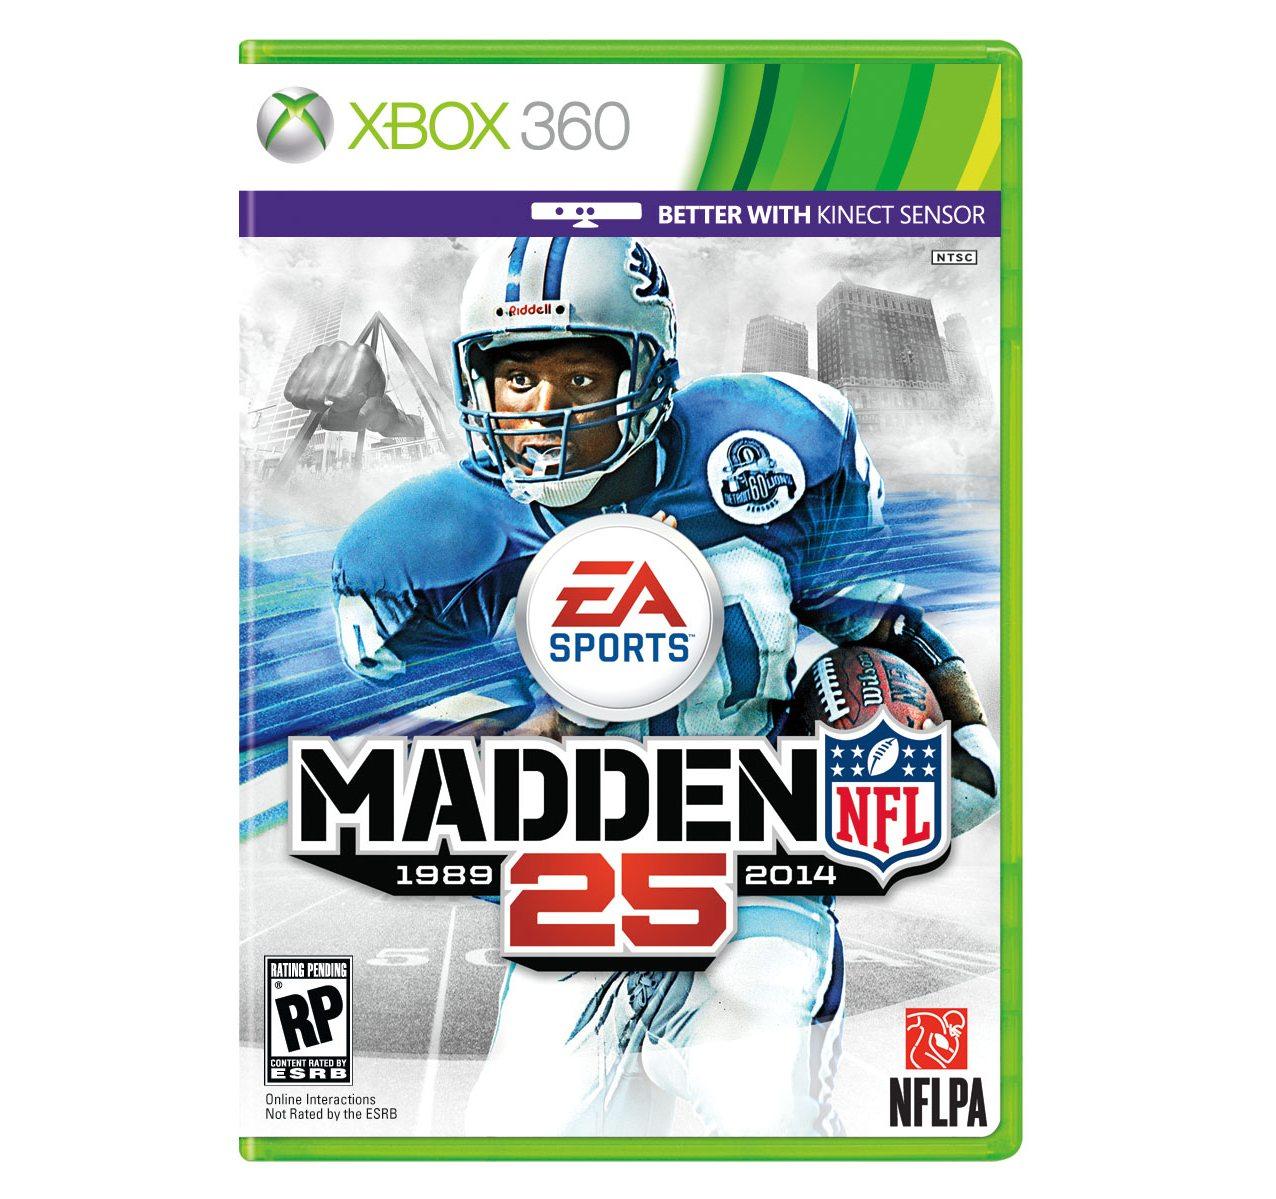 Xbox 360 Madden NFL 25 Xbox 360